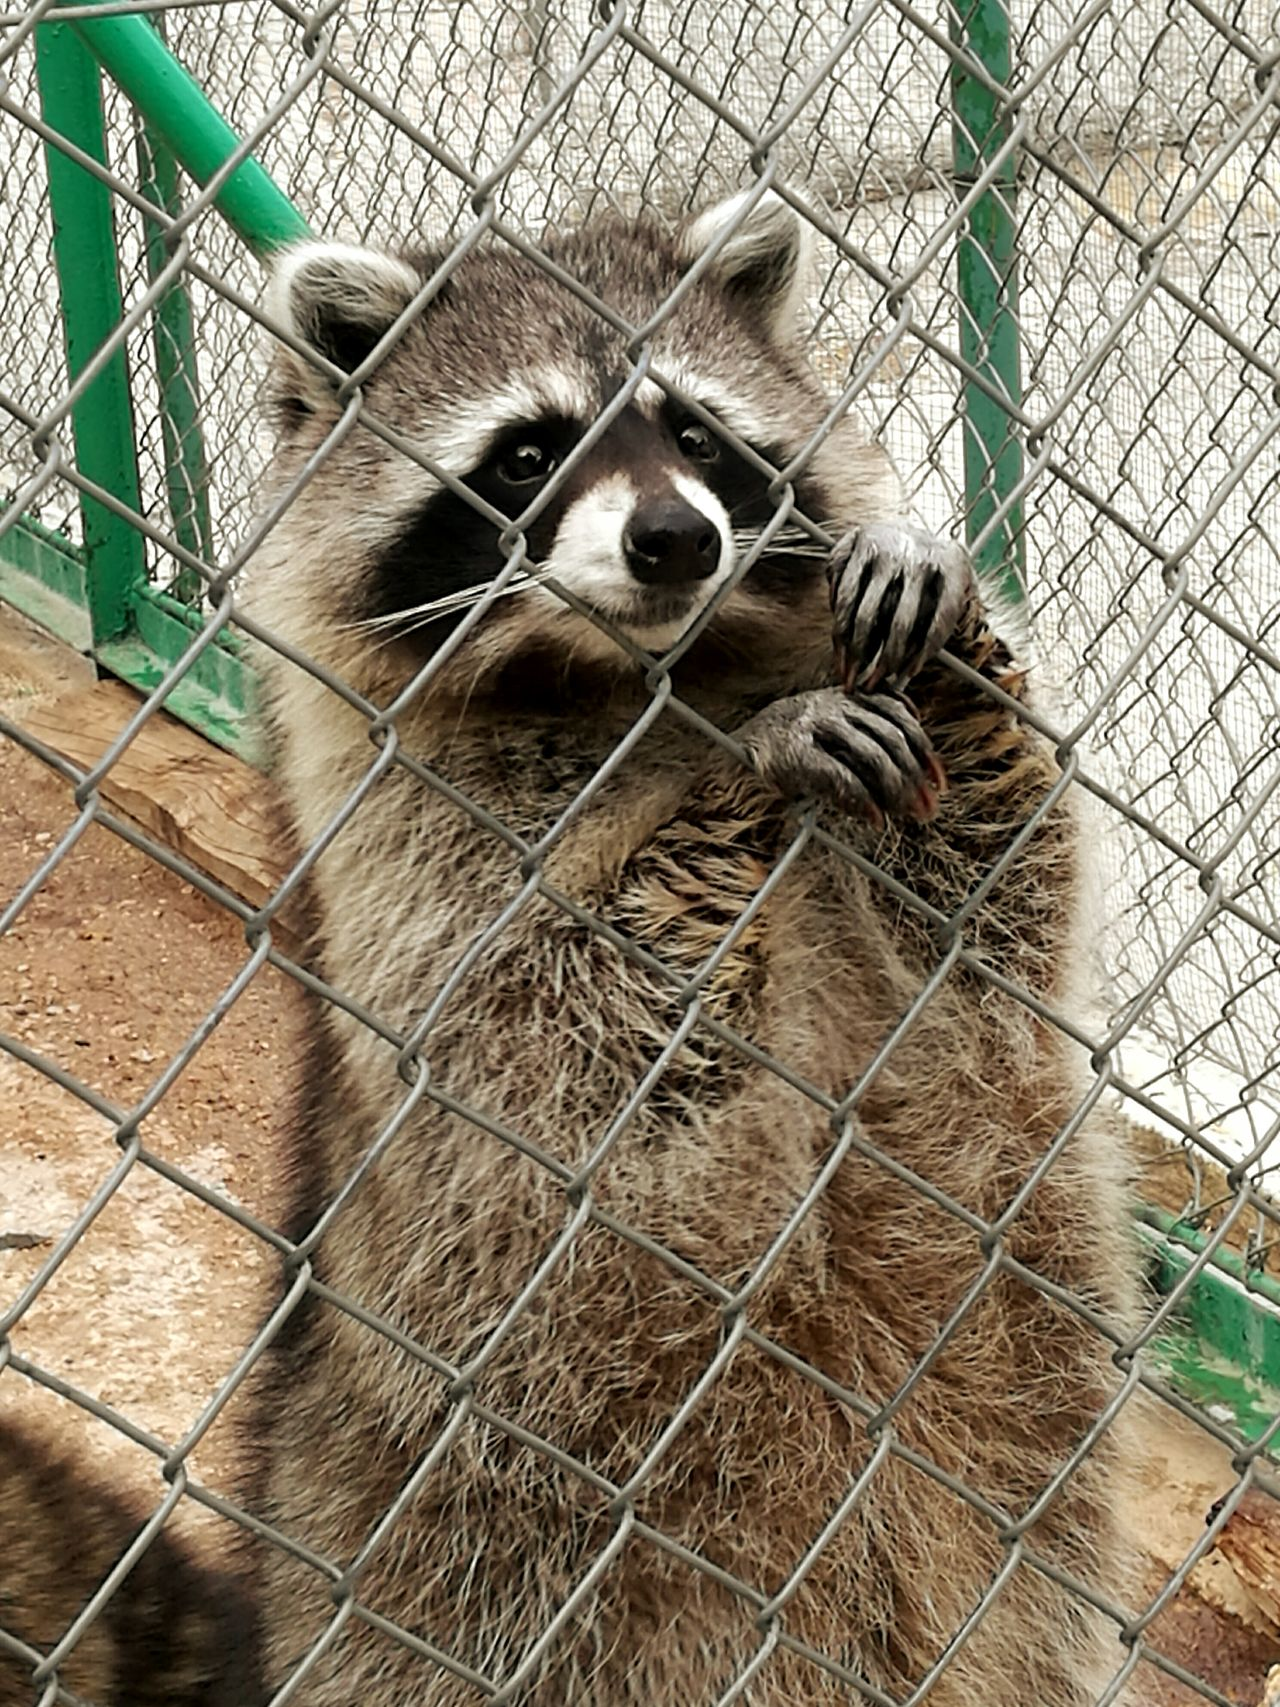 One Animal Animal Themes Animals In Captivity Wildlife Zoo Close-up Outdoors Toulon Faron Ratton Laveur